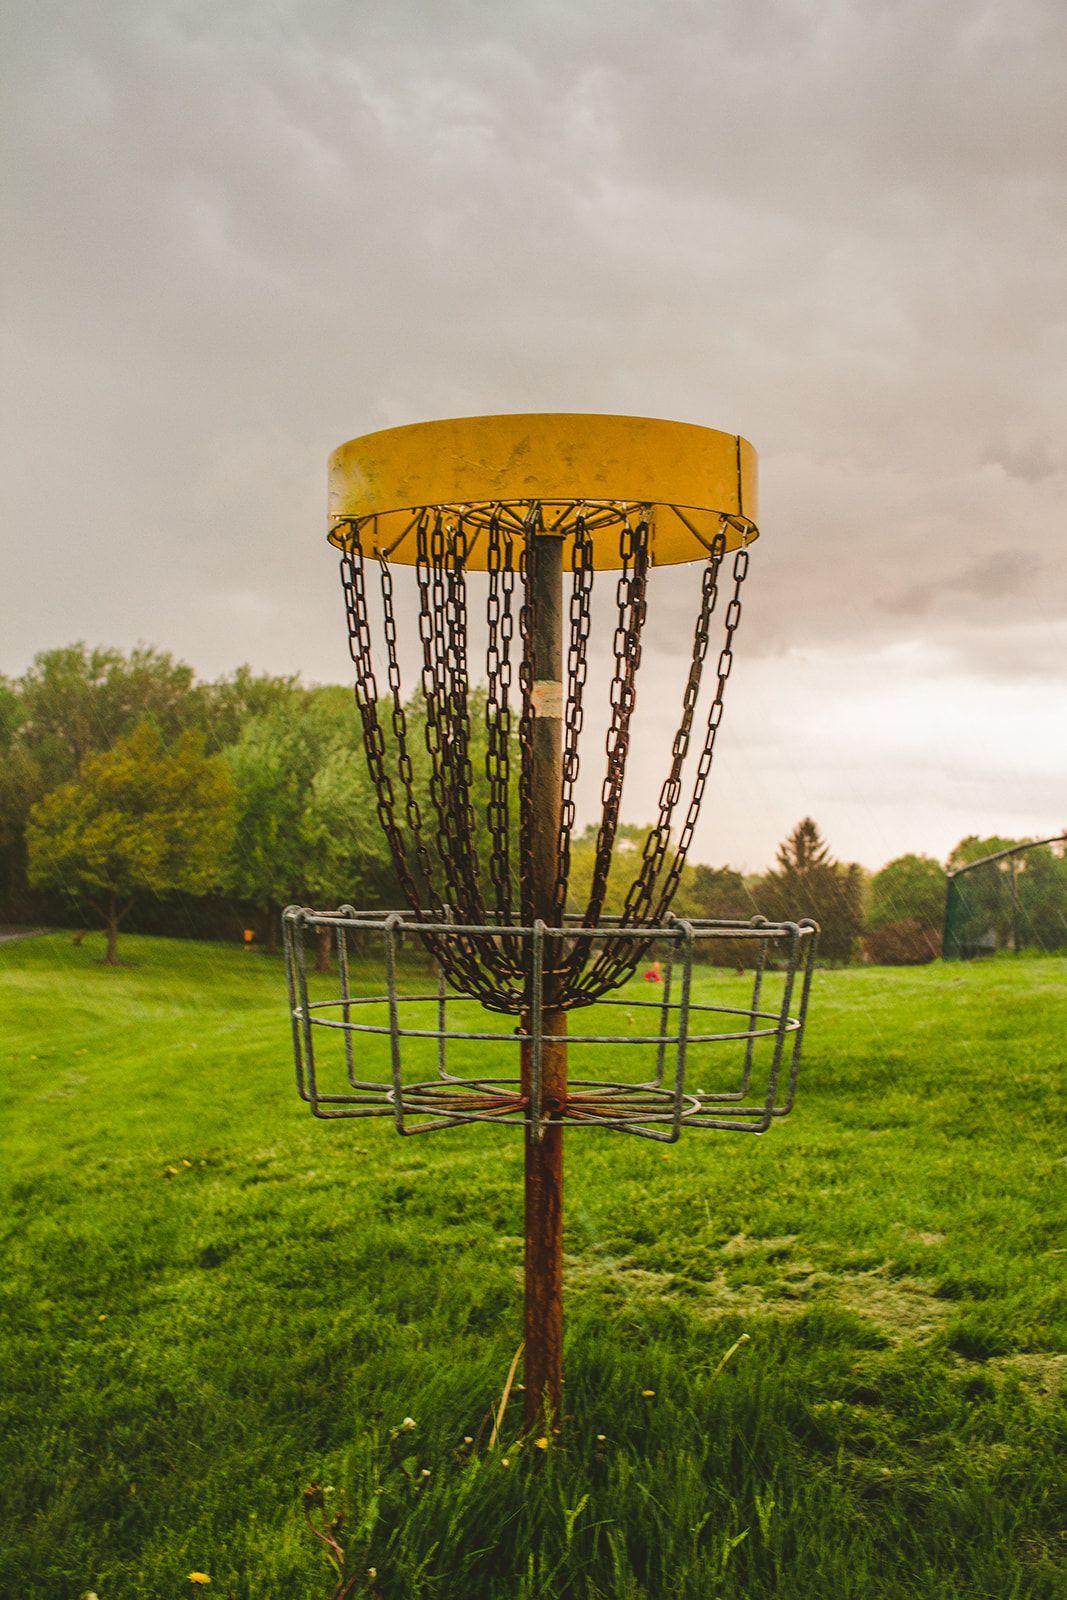 20+ Beginner disc golf courses near me ideas in 2021